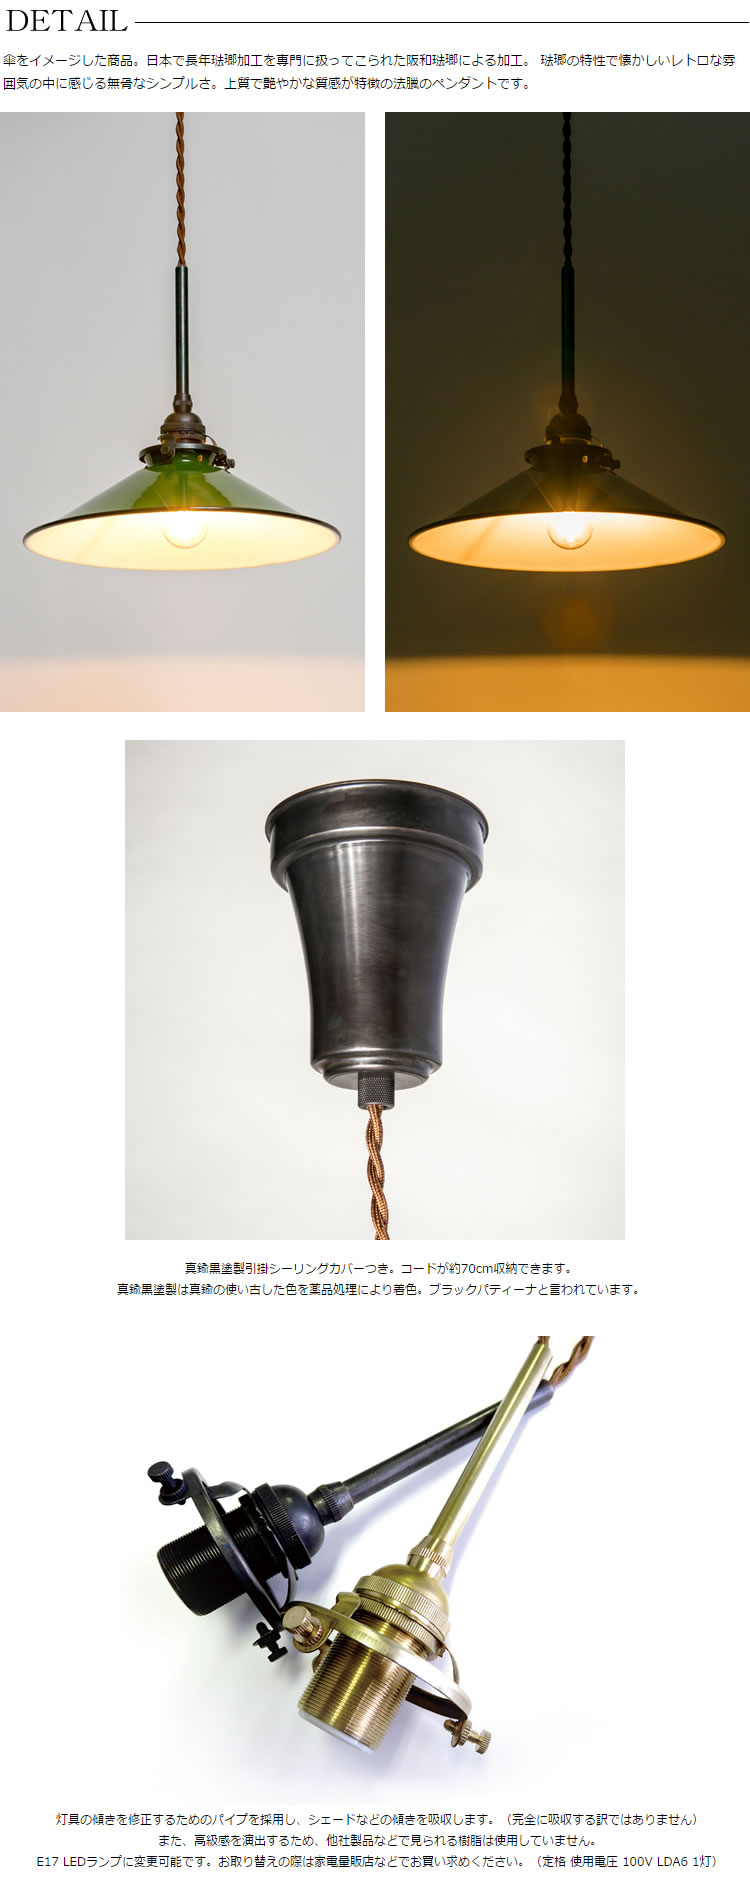 KASA(ホーロー緑・引掛・真鍮黒染)